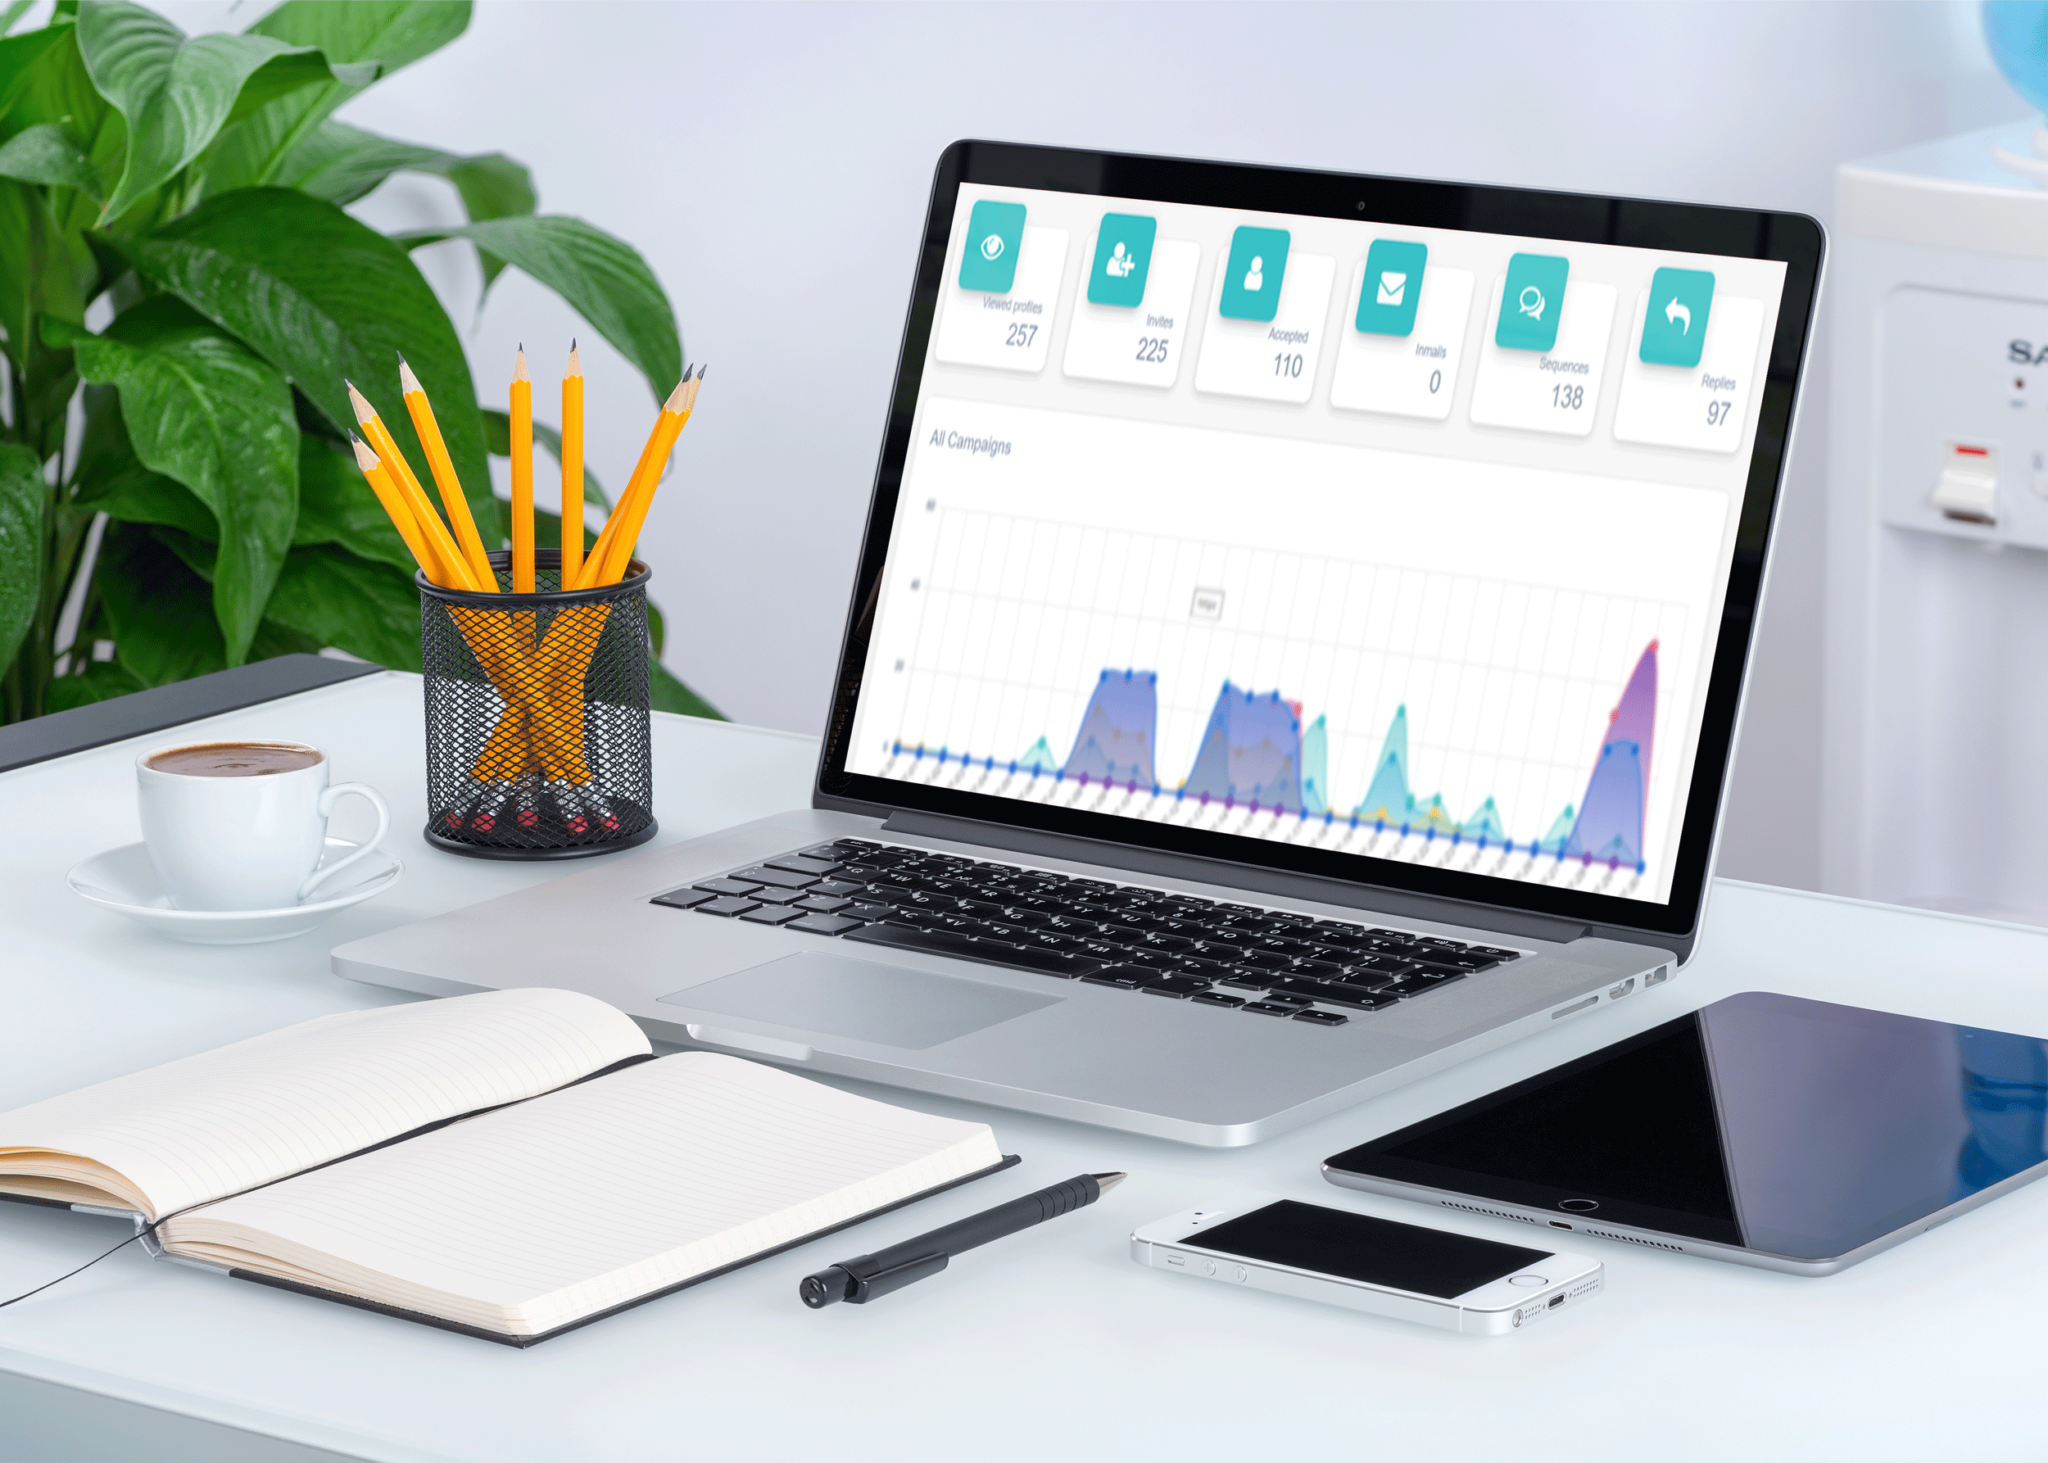 Macbook-on-Desk-Mockup-PSD